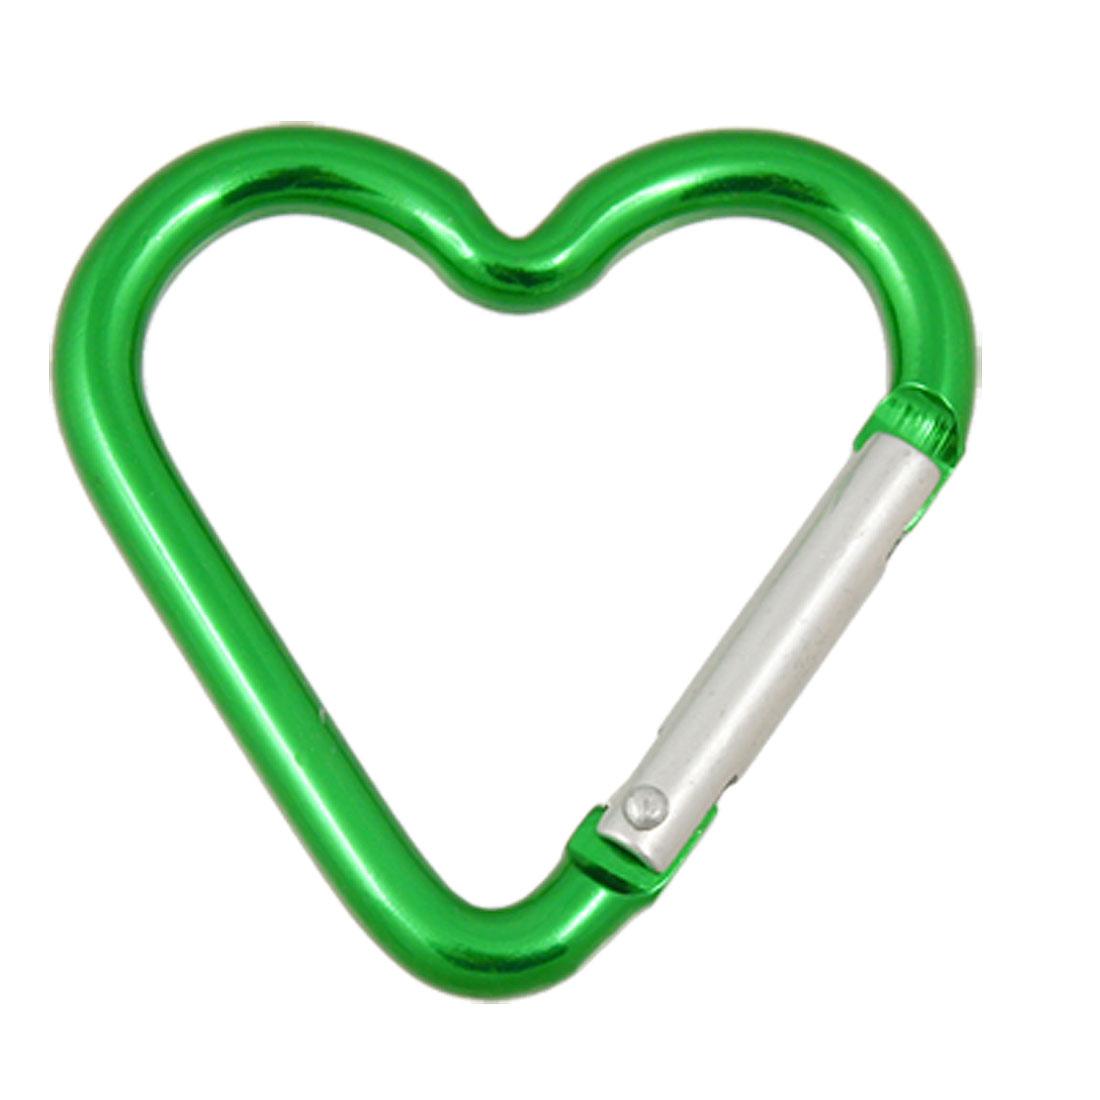 Aluminum Heart Shape Silver Tone Green Spring Gate Carabiner Hook